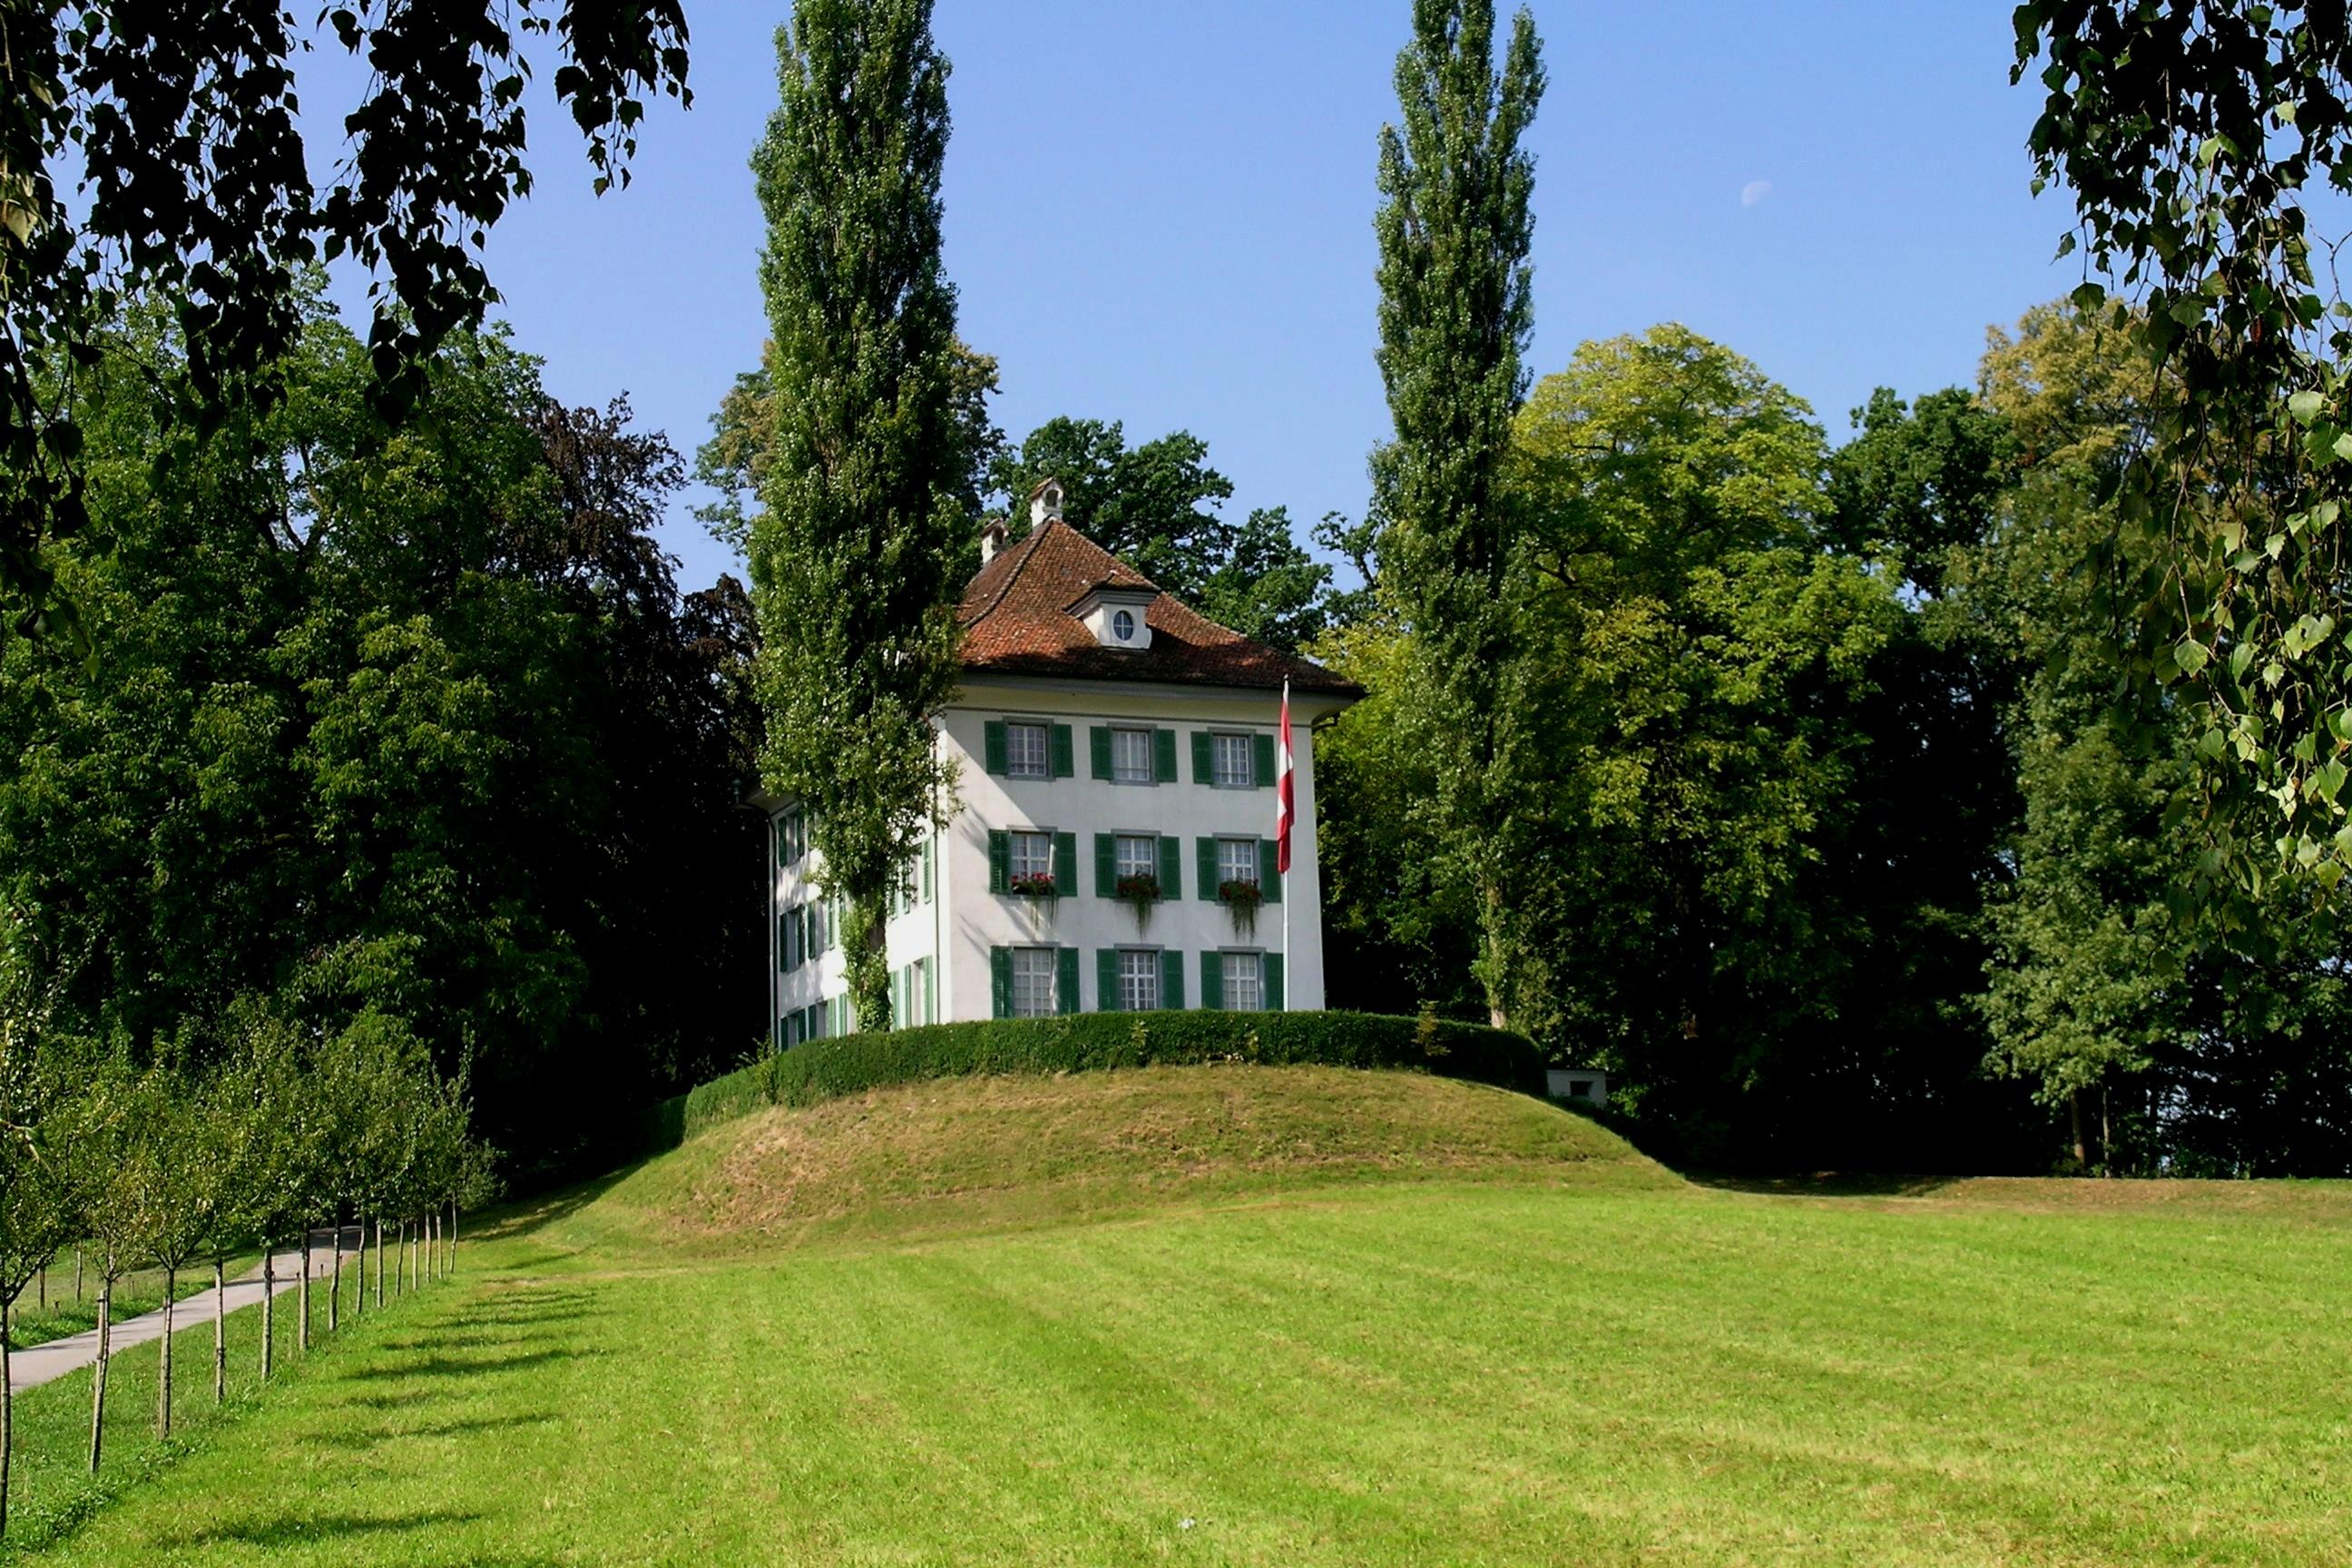 Bild Richard Wagner Museum Luzern